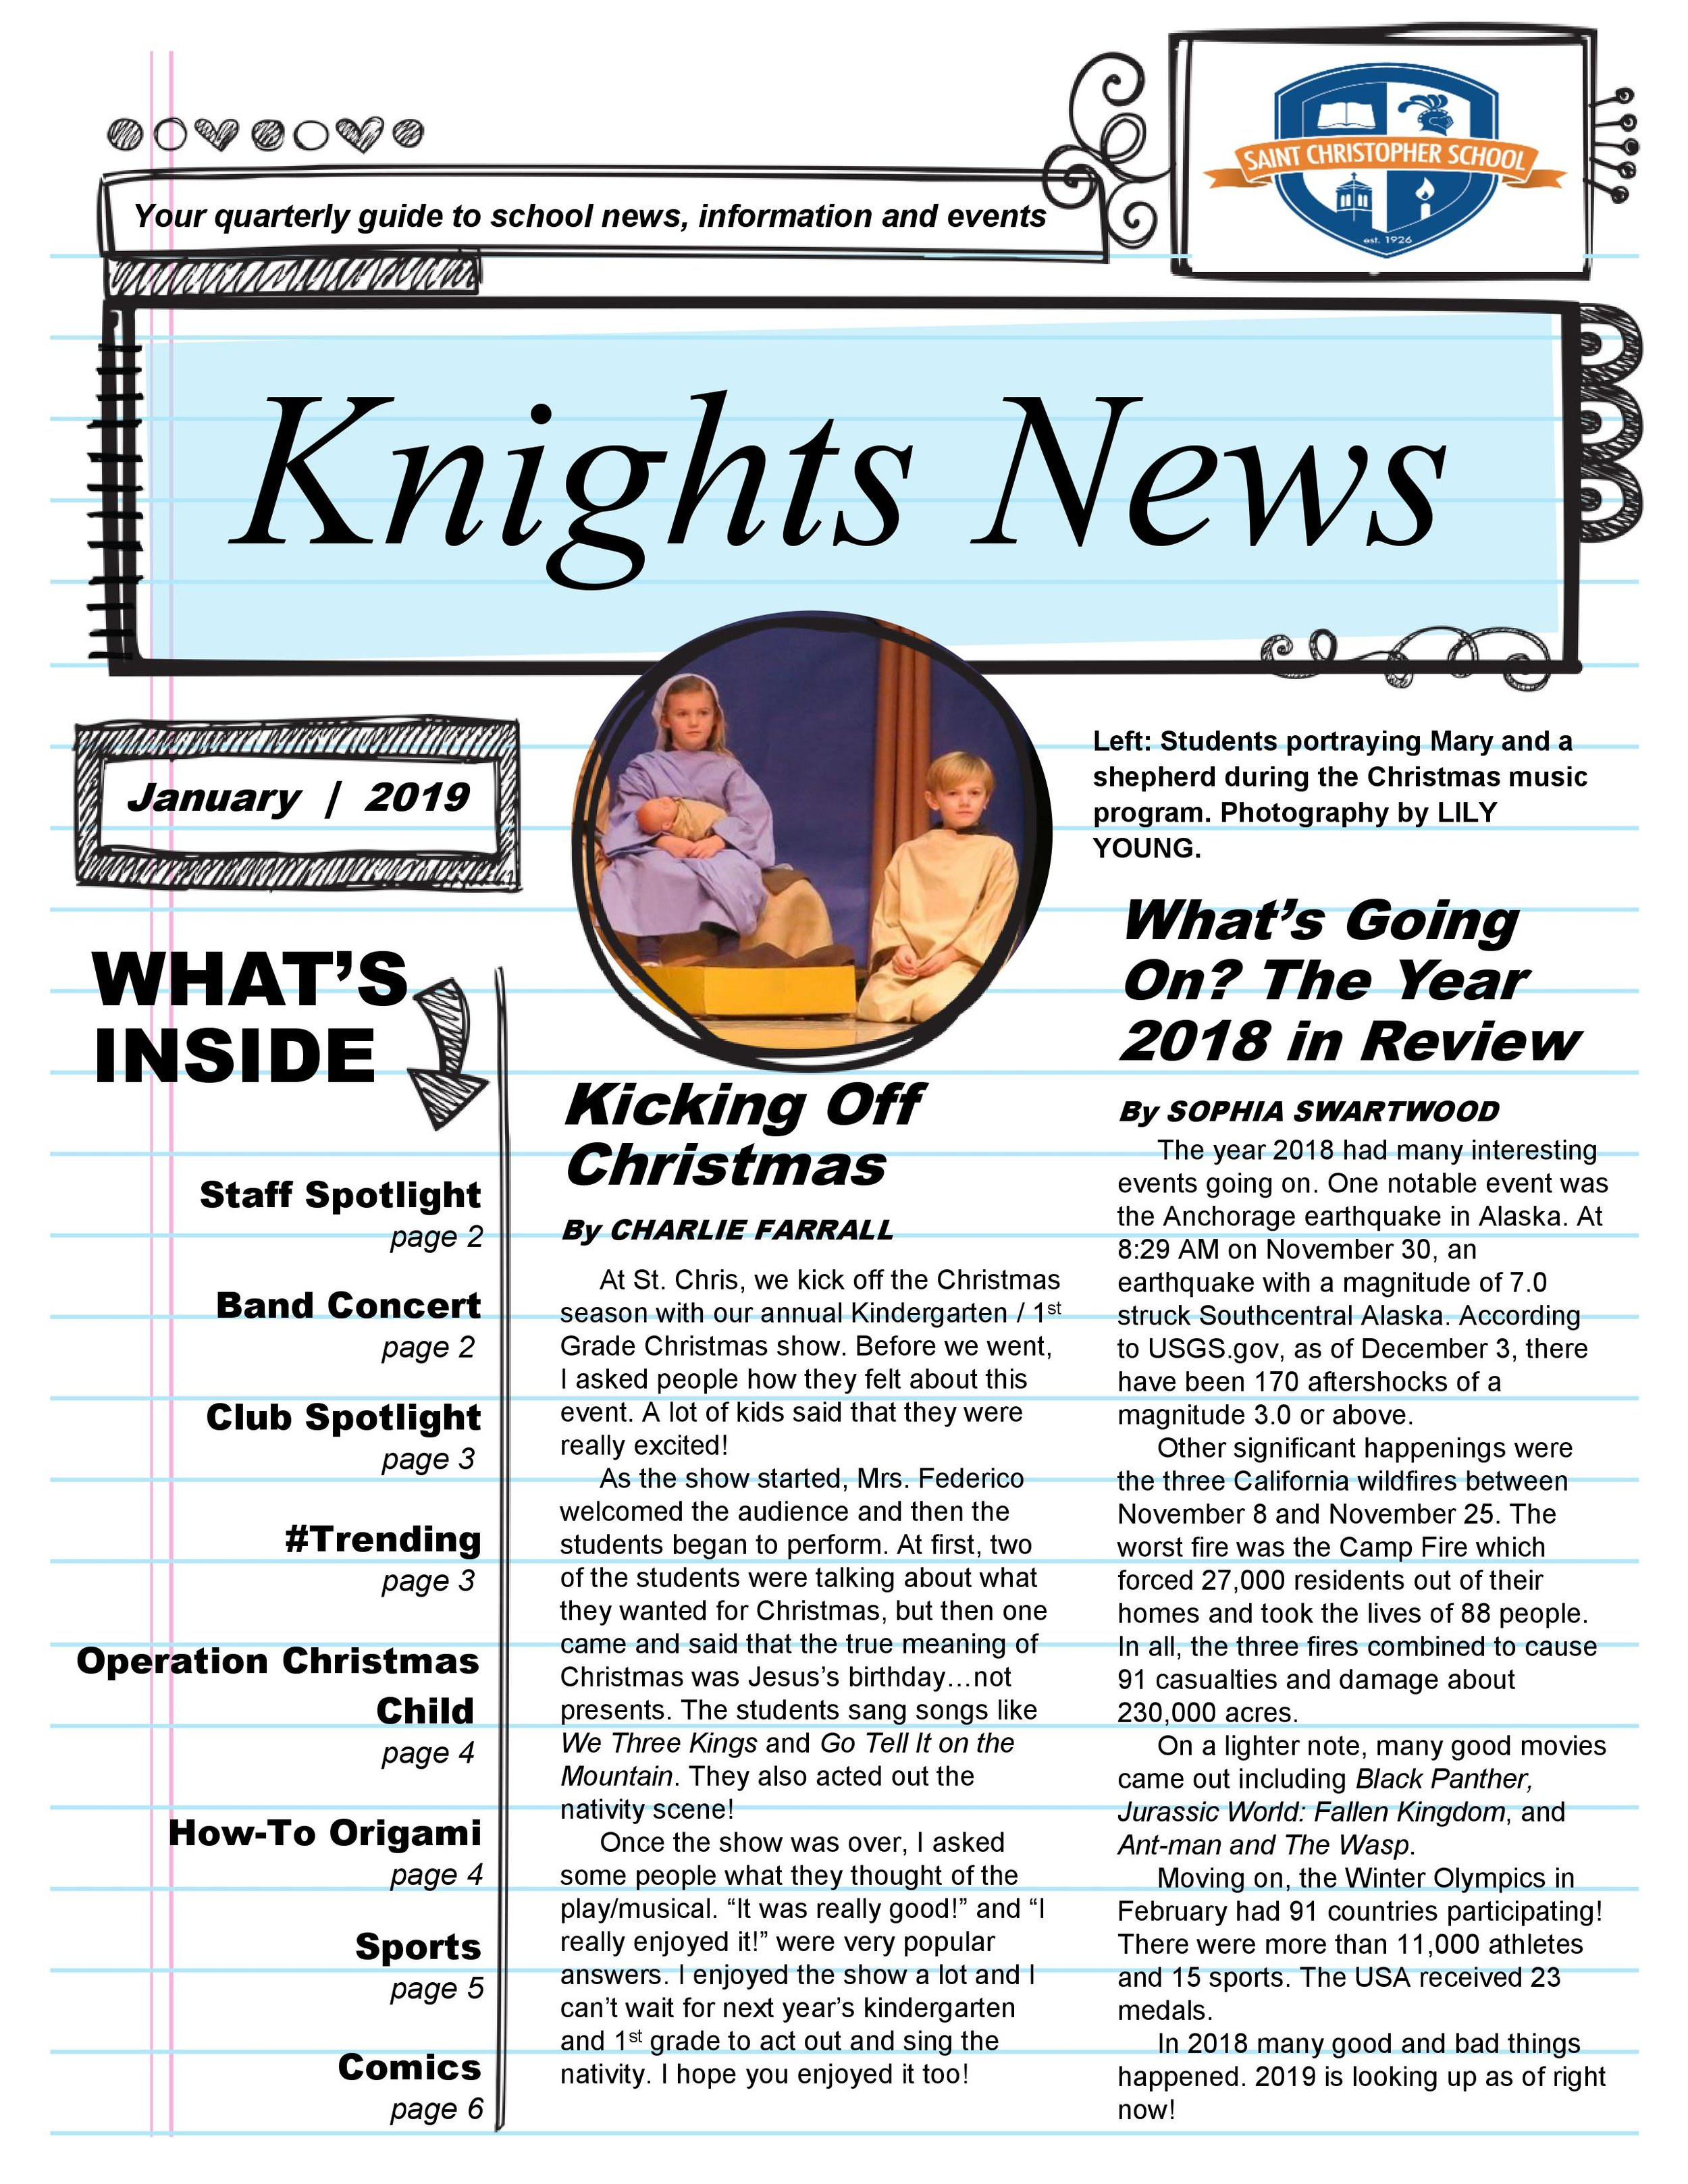 Jan 2019 news page 1.jpg